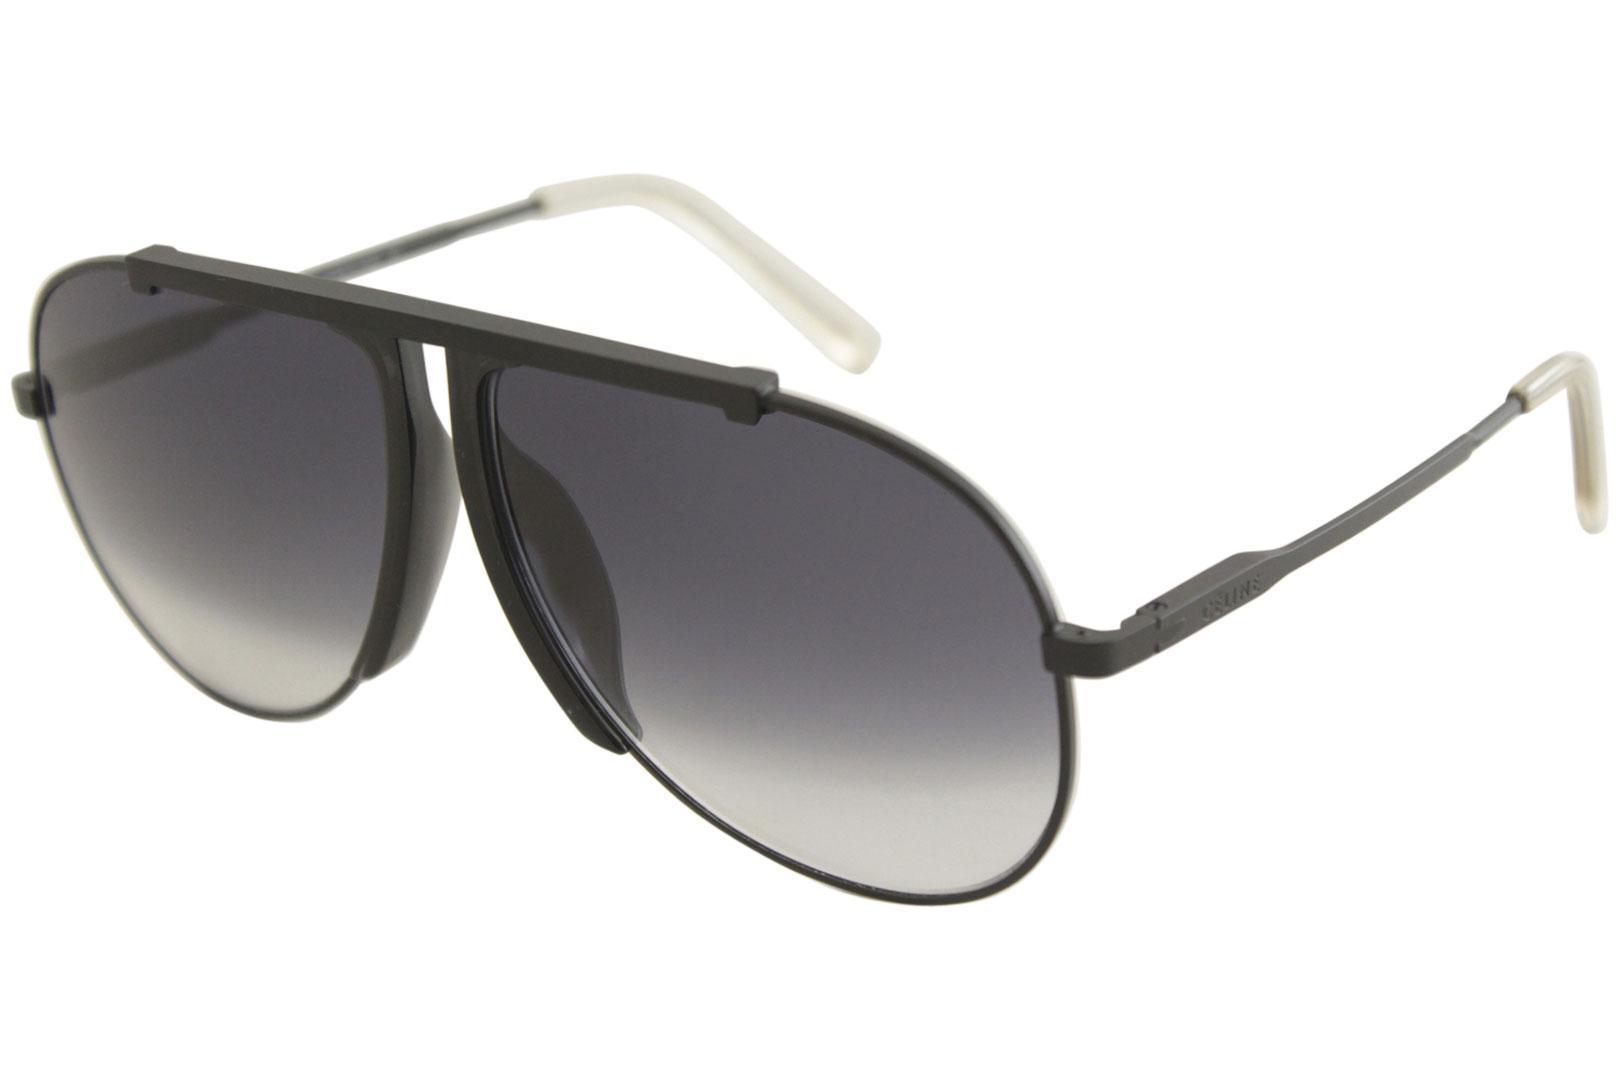 31bc8a18e5e Celine Women s CL40026I CL 40026 I Fashion Pilot Sunglasses